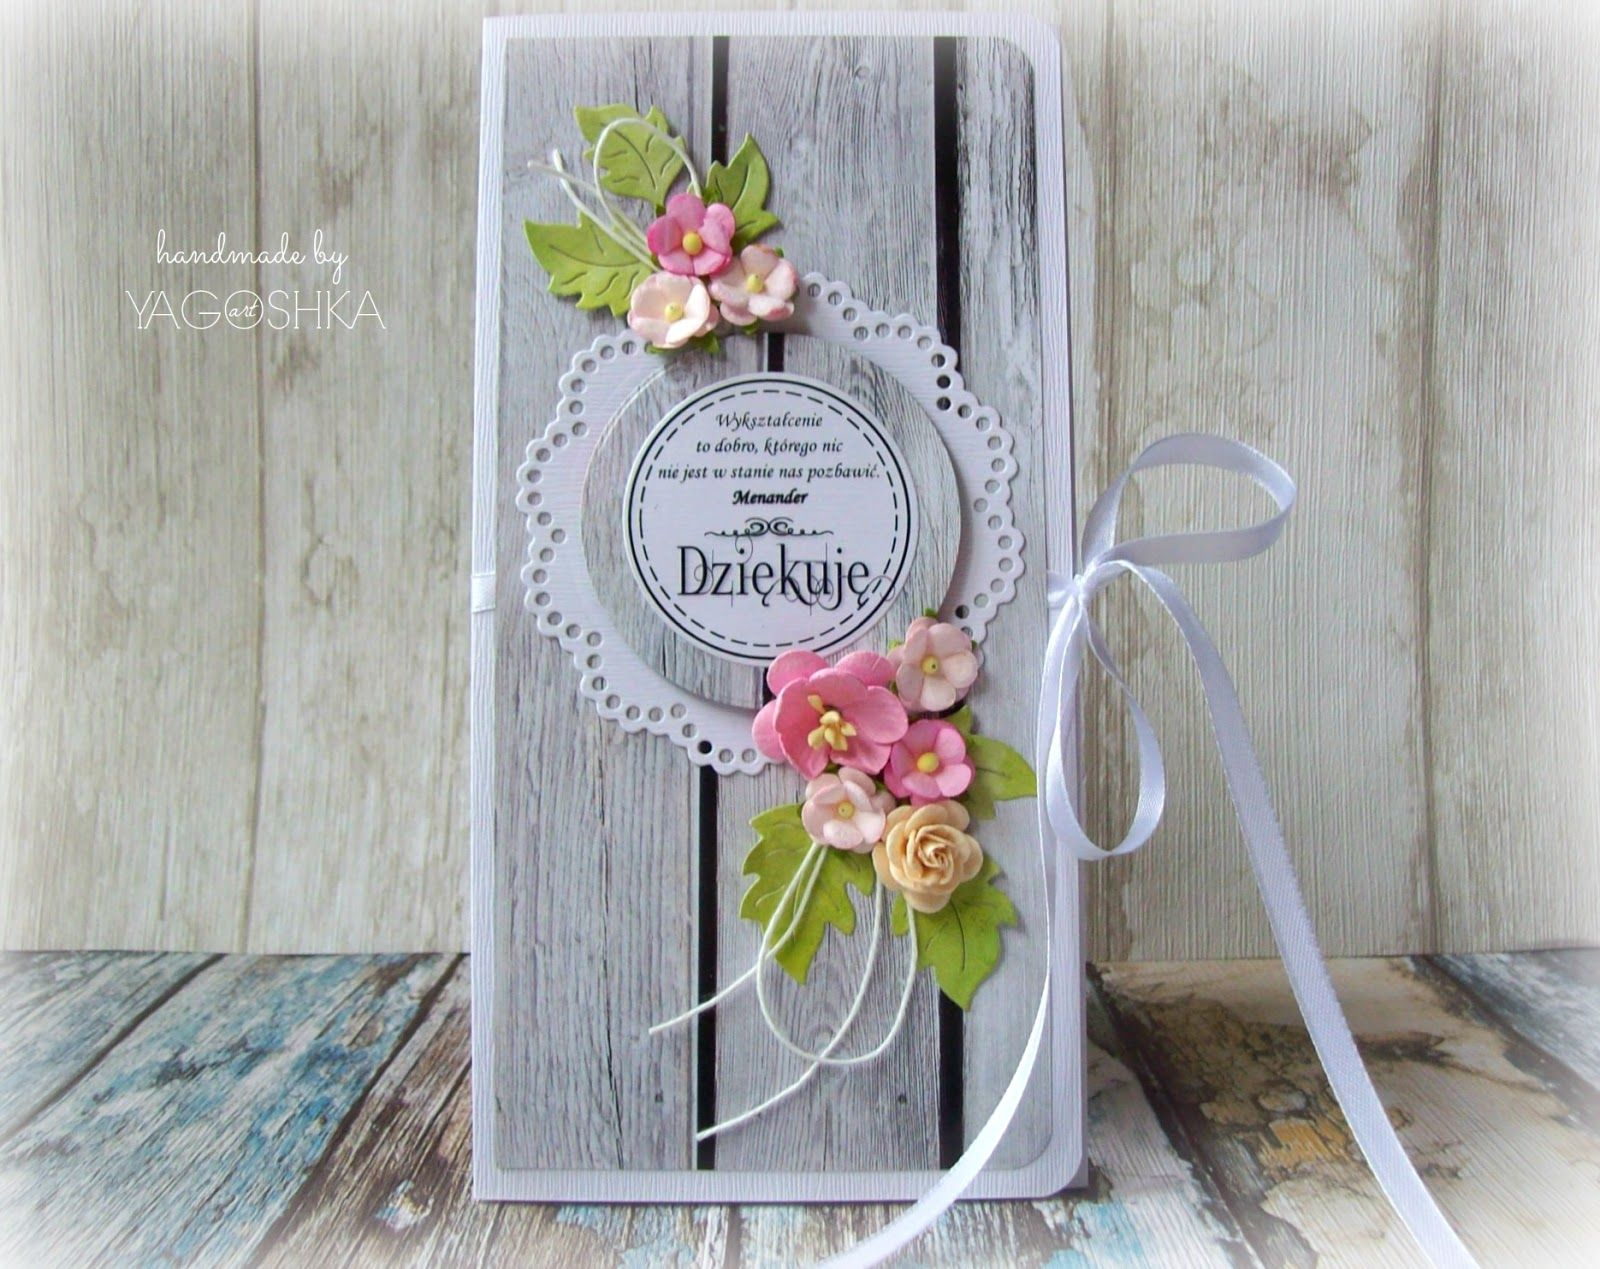 Yagoshka Art Rekodzielo Scrapbooking Decoupage Diy Kartki Na Zakonczenie Wreaths Decor Hoop Wreath